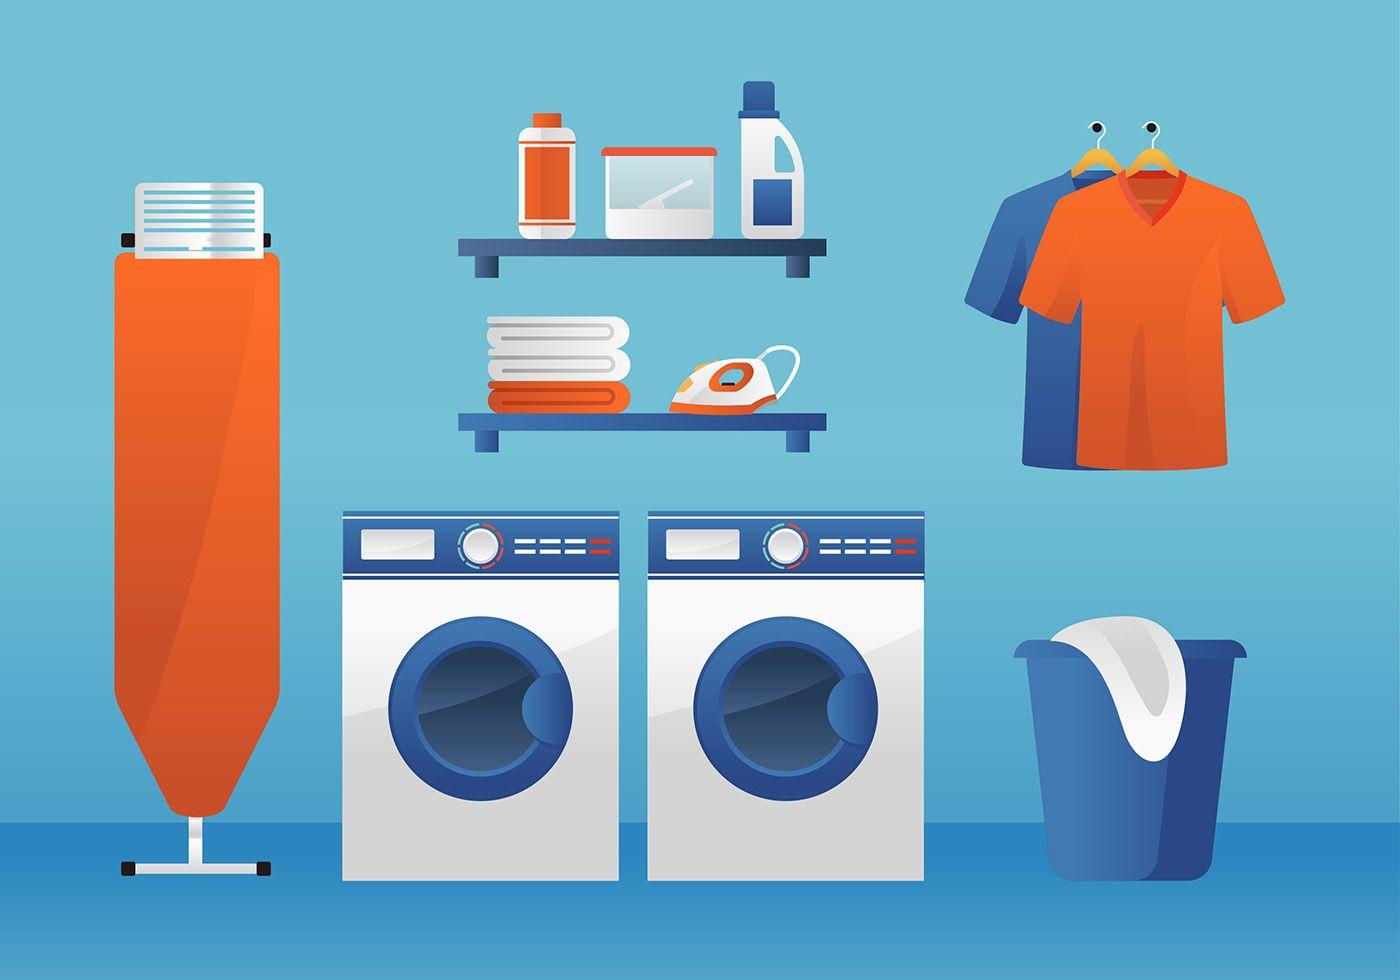 Laundry Room Ironing Board Free Vector | Vector art design ...